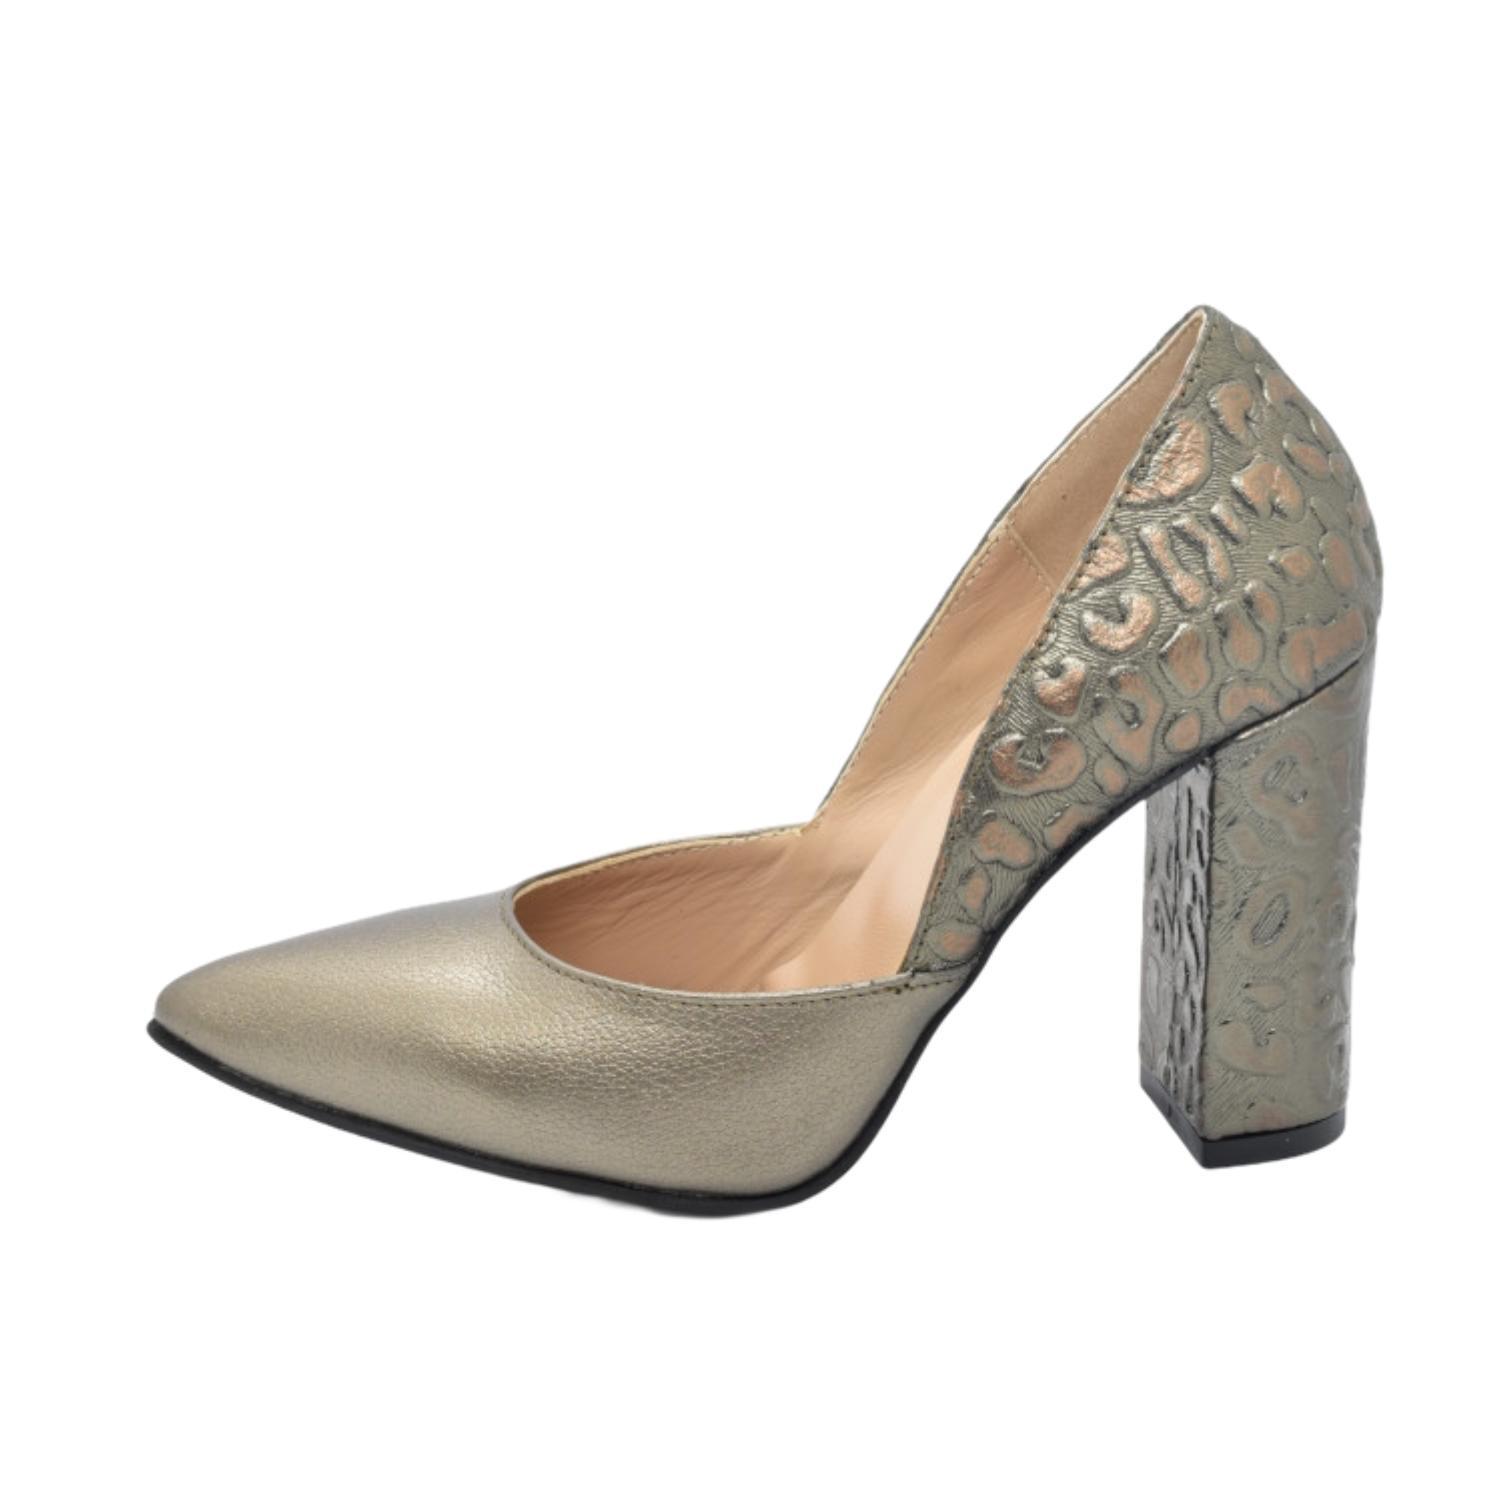 Pantofi aurii cu model abstract